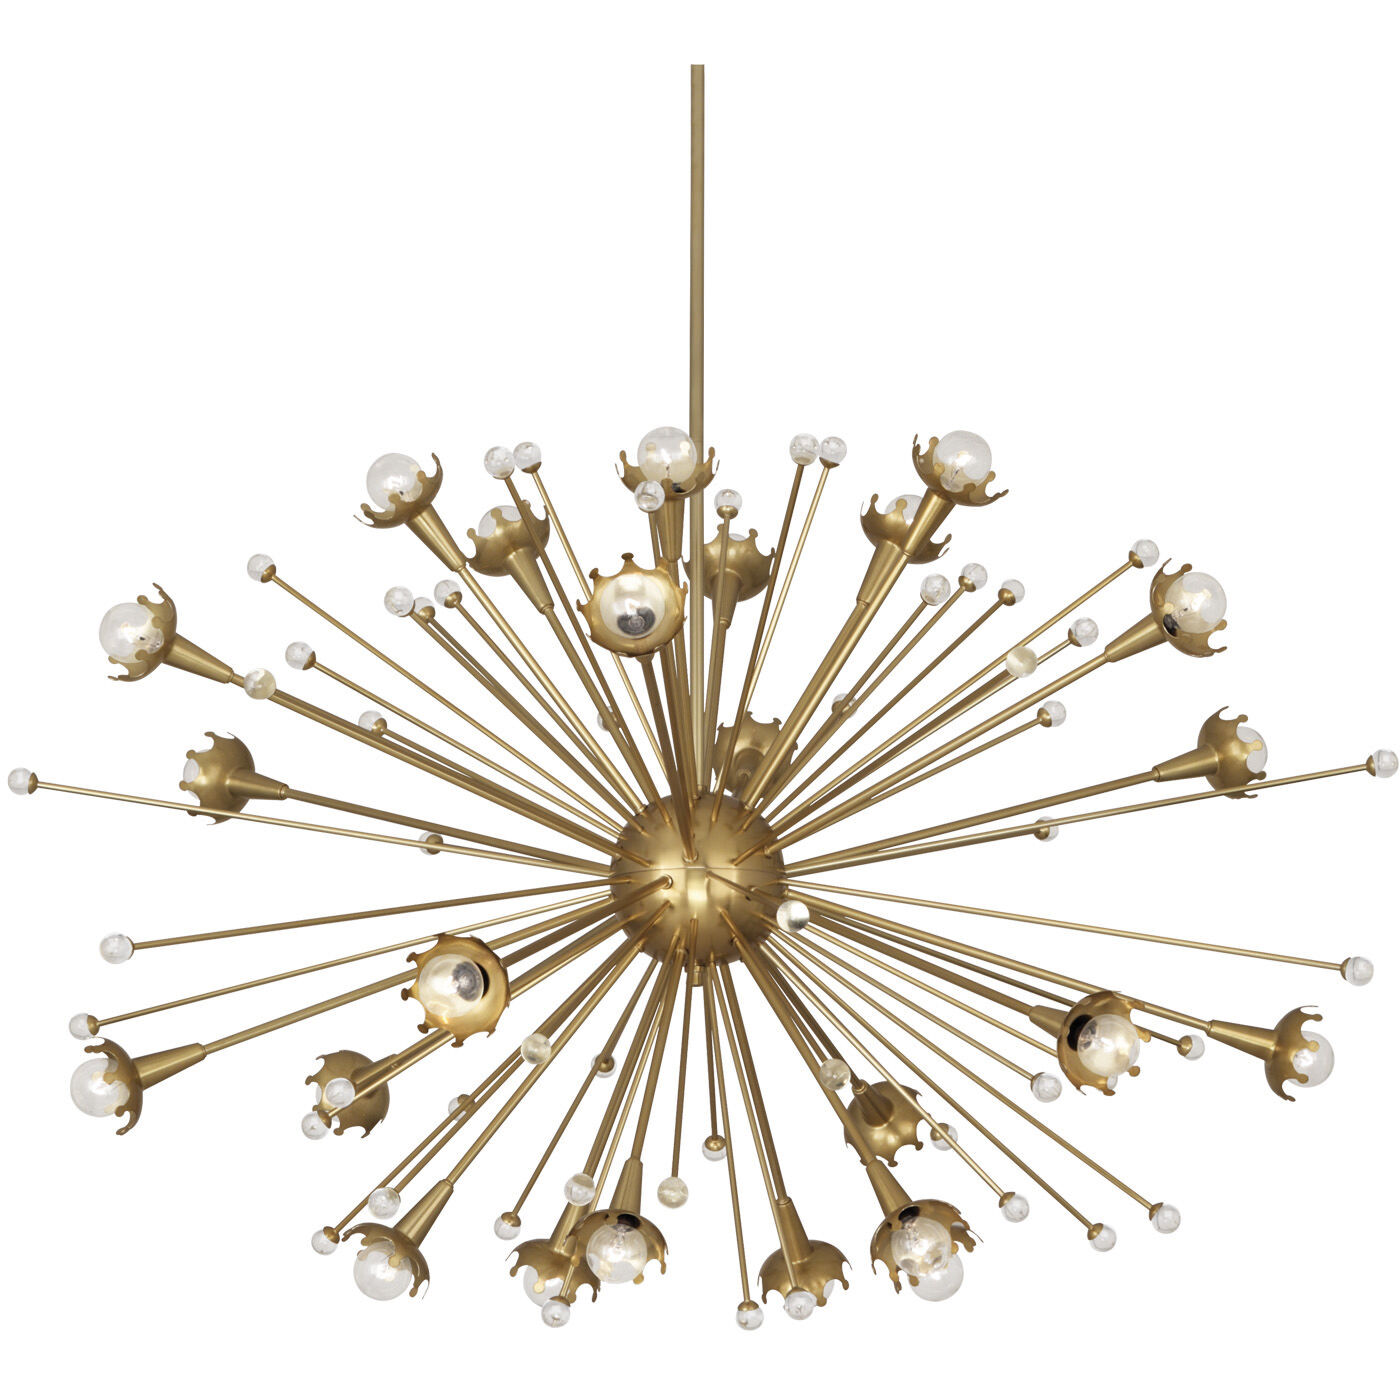 chandeliers giant sputnik chandelier - Starburst Chandelier